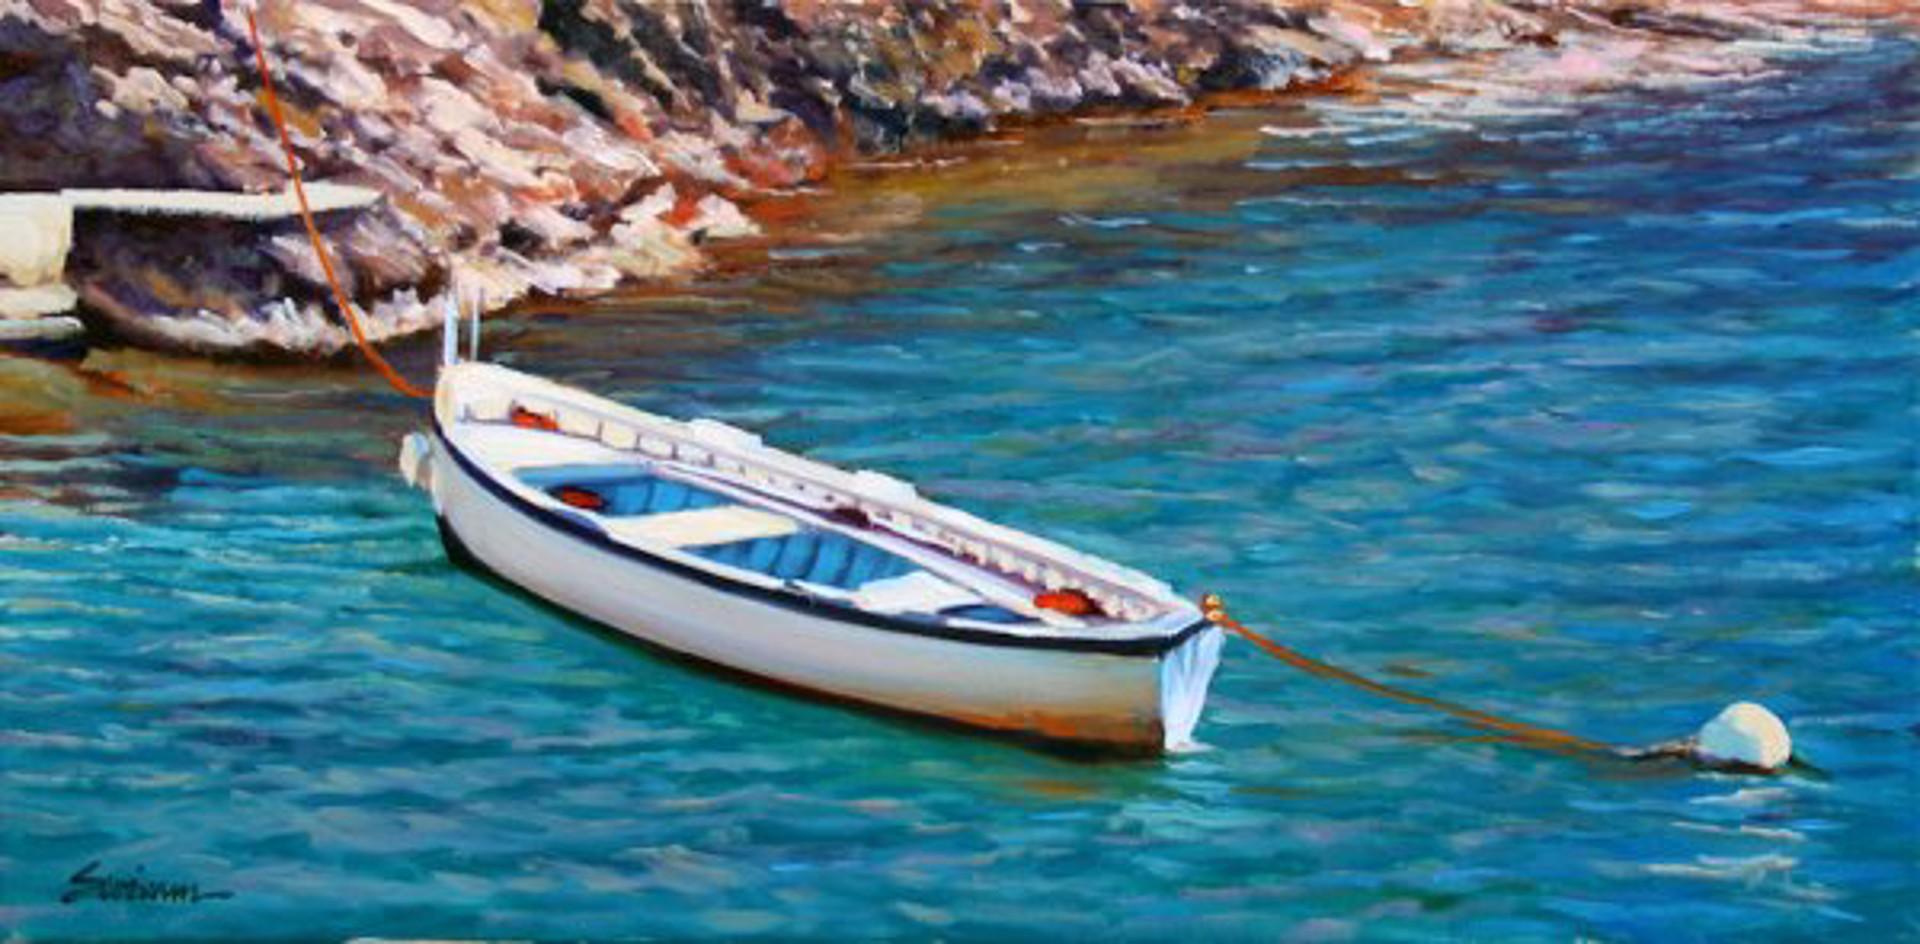 Swimm: Praiano Cove by Tom Swimm